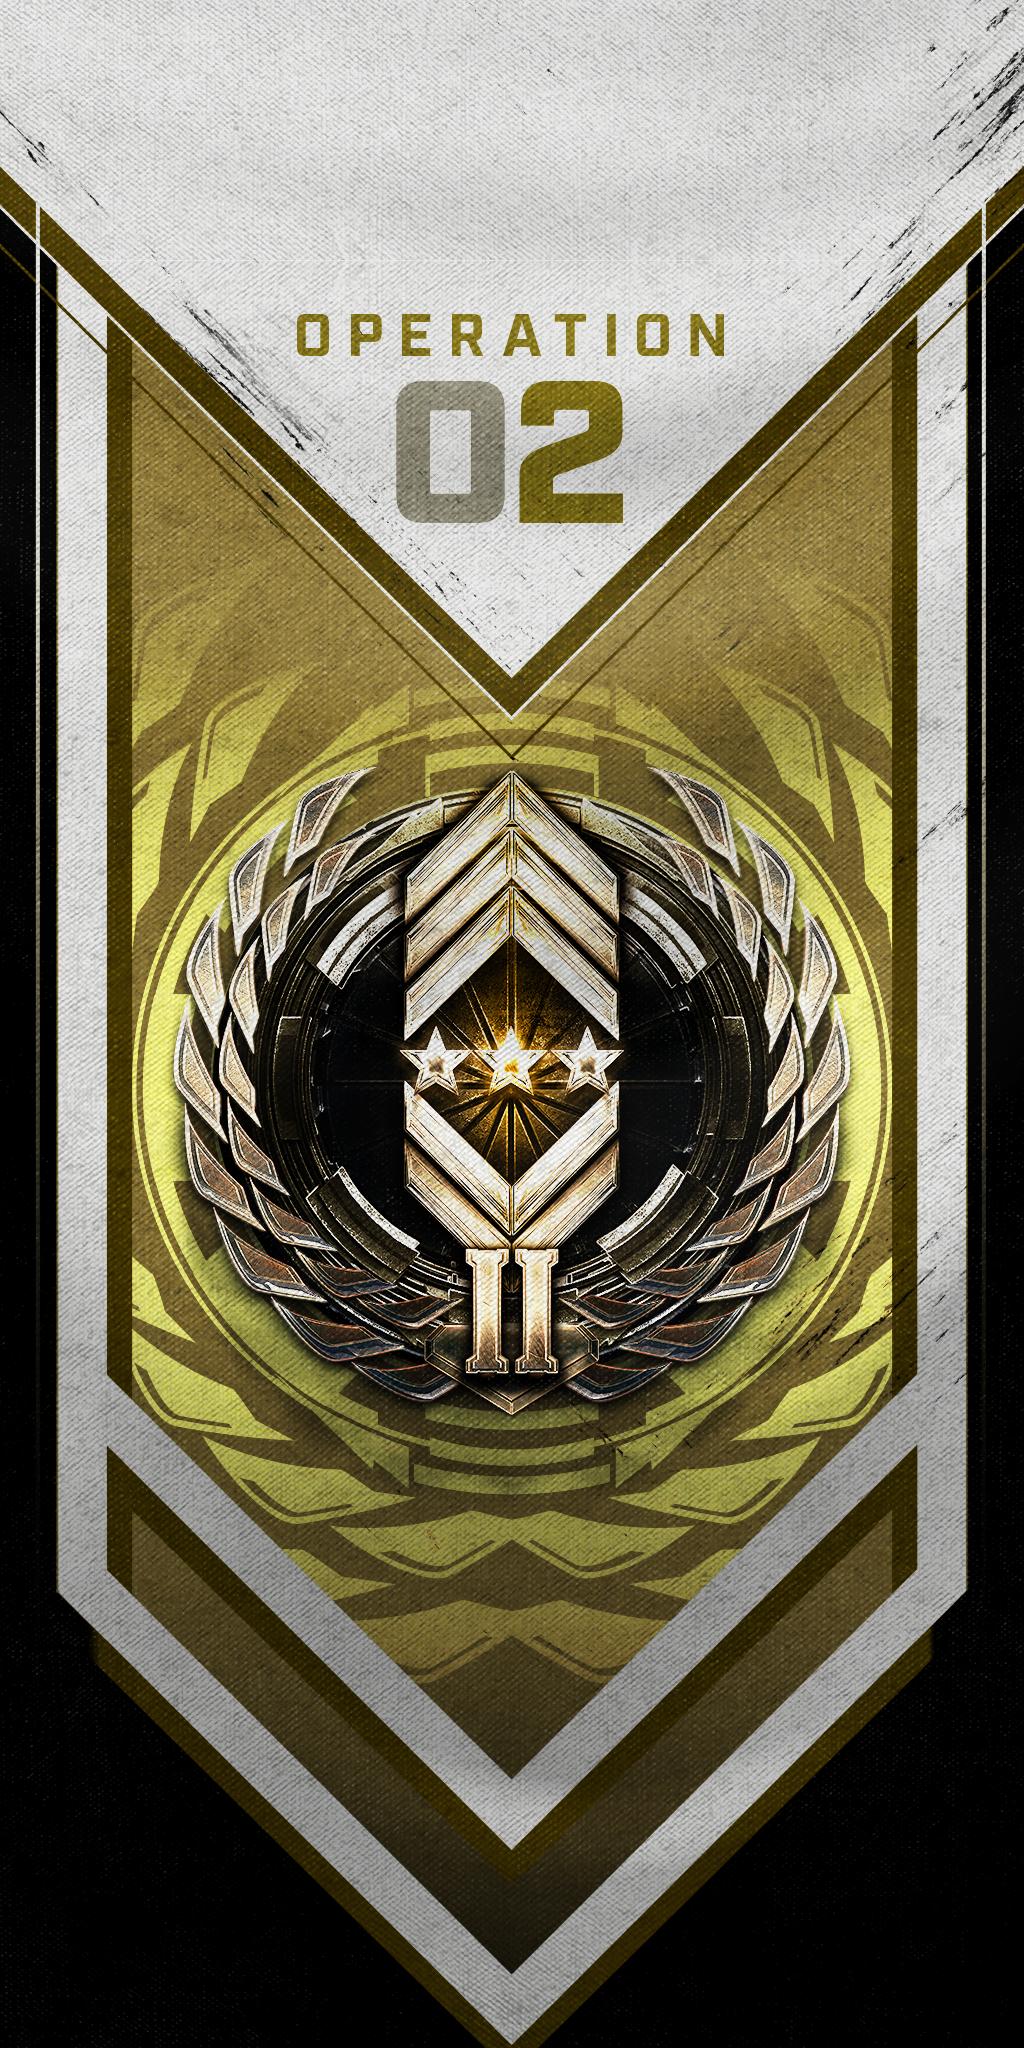 Colonel II Banner reward